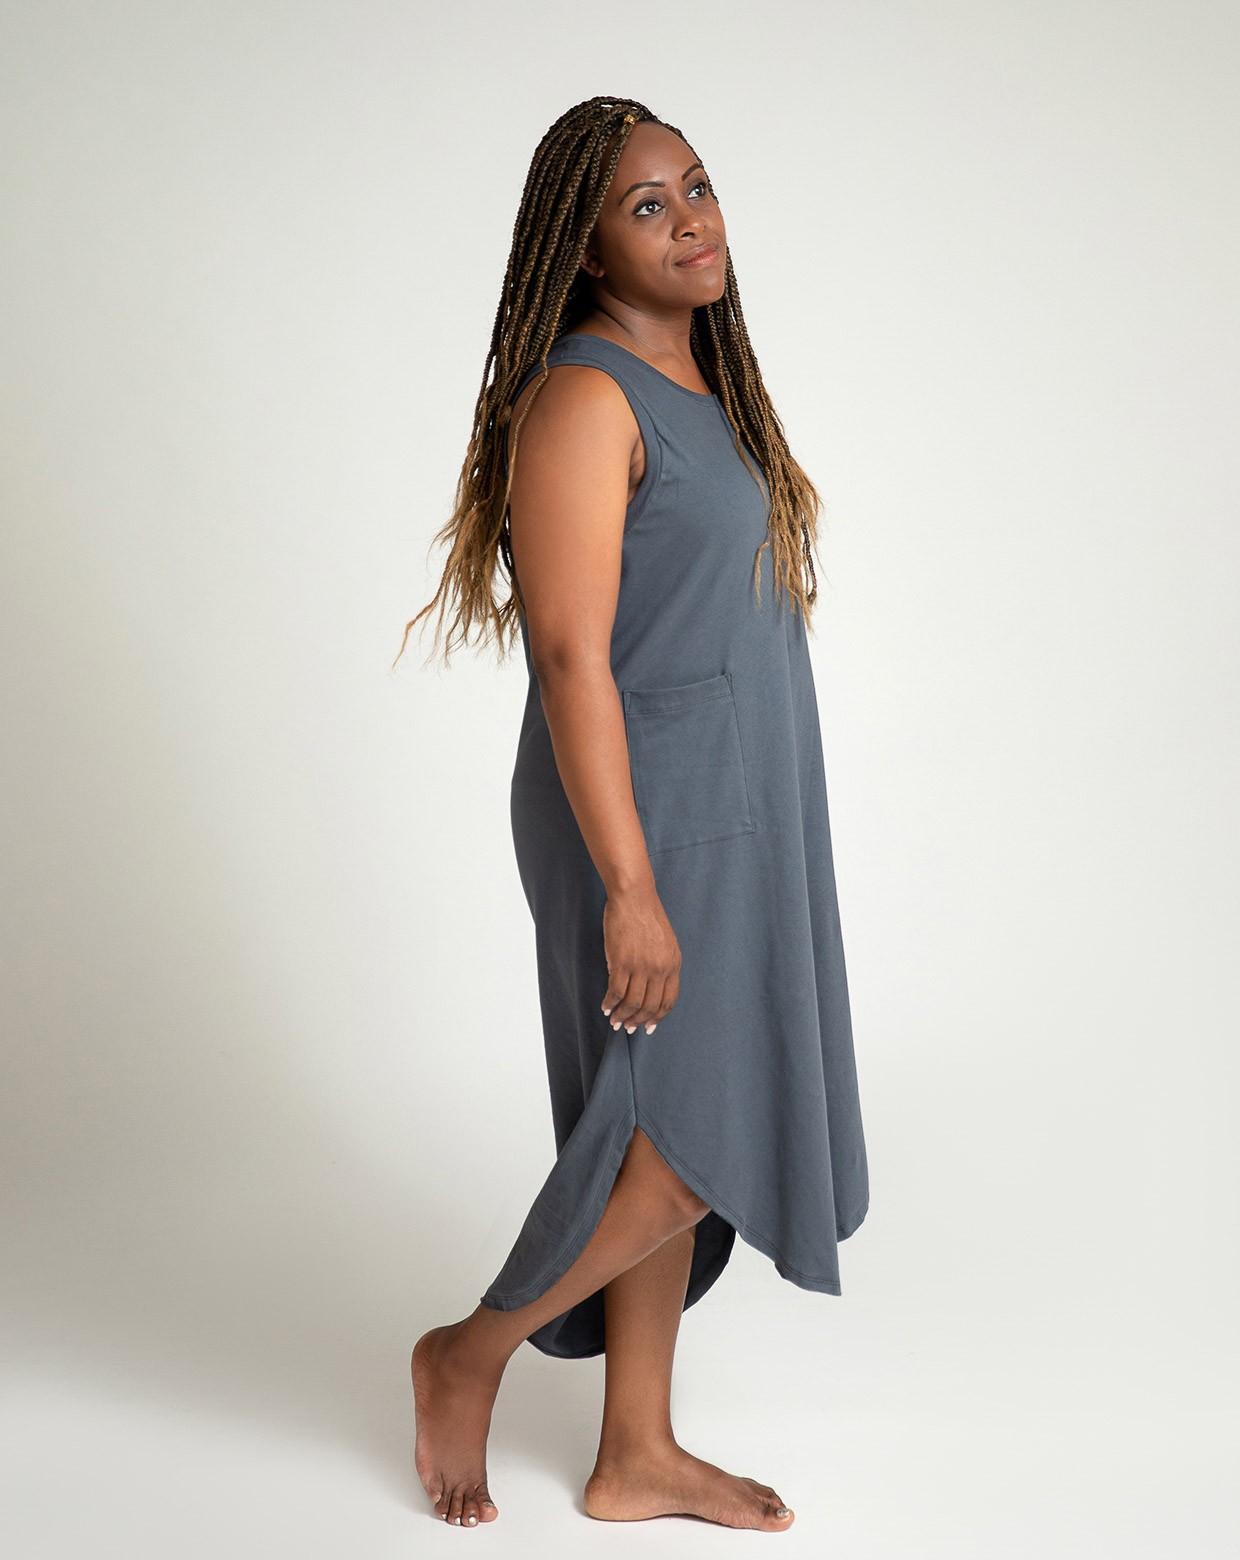 Vestido Ágata Cinza - Algodão  Sustentável